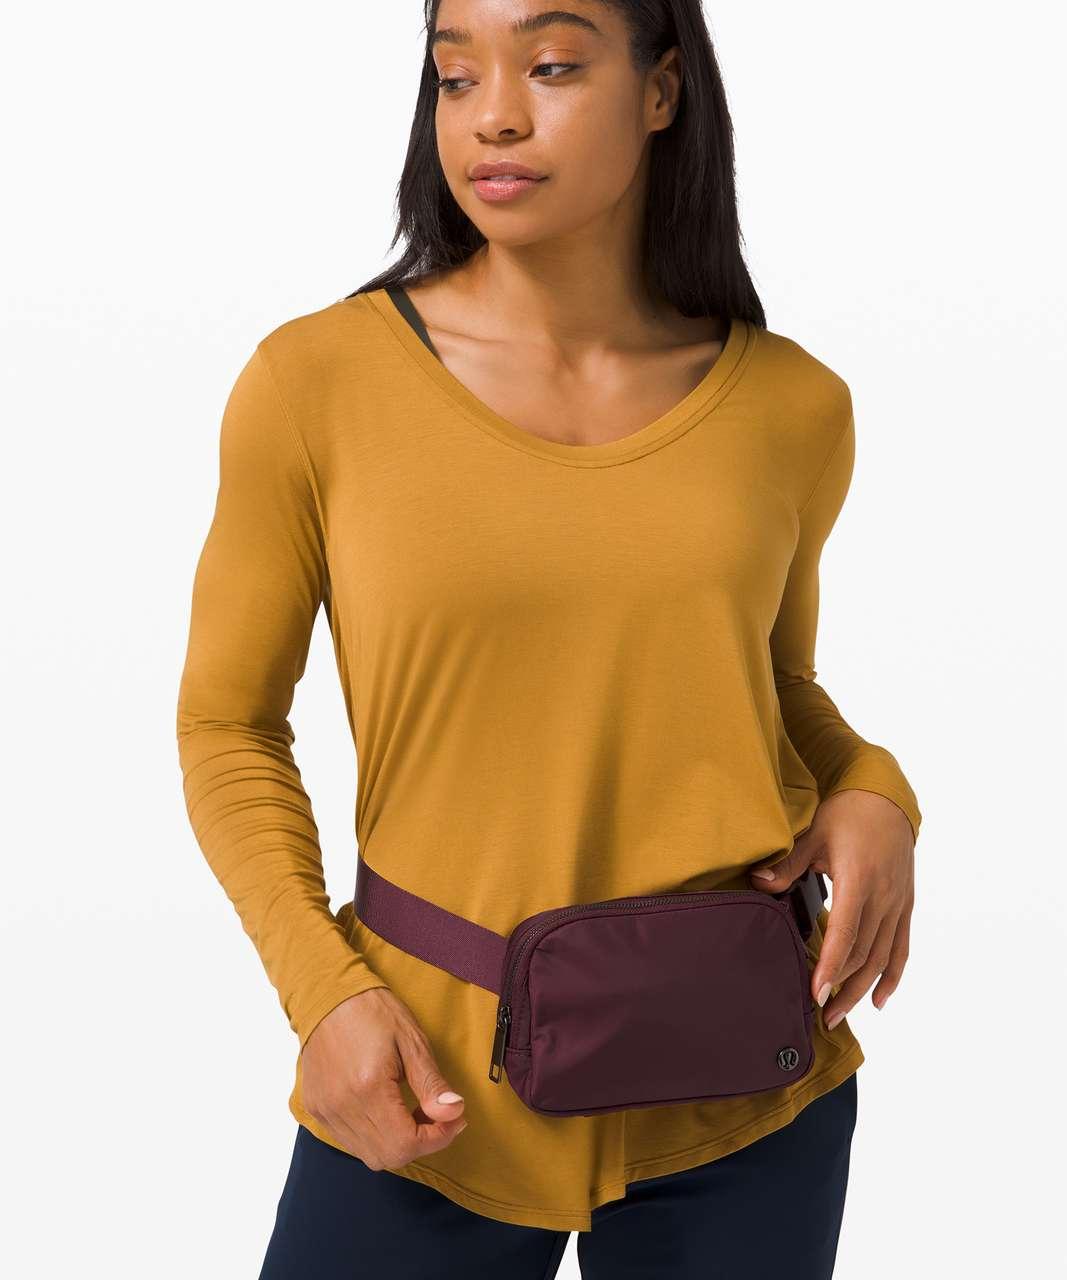 Lululemon Everywhere Belt Bag *1L - Cassis